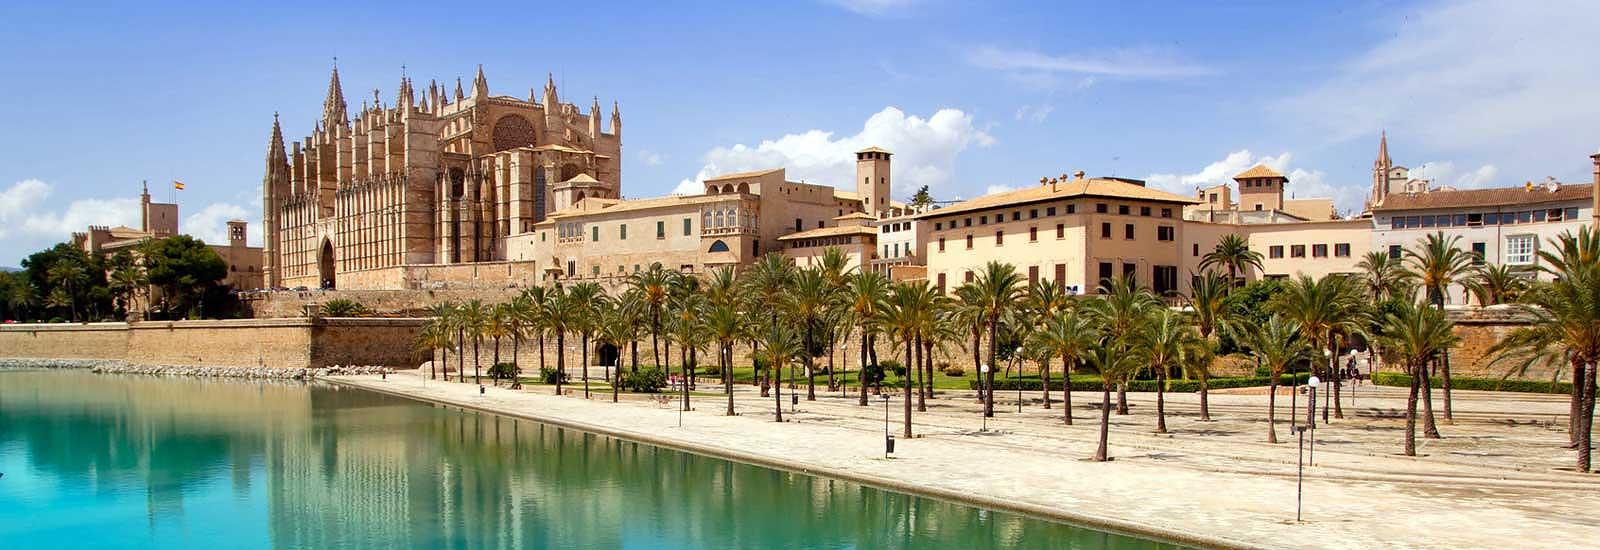 luxus Feriendomizile Mallorca Kontakt